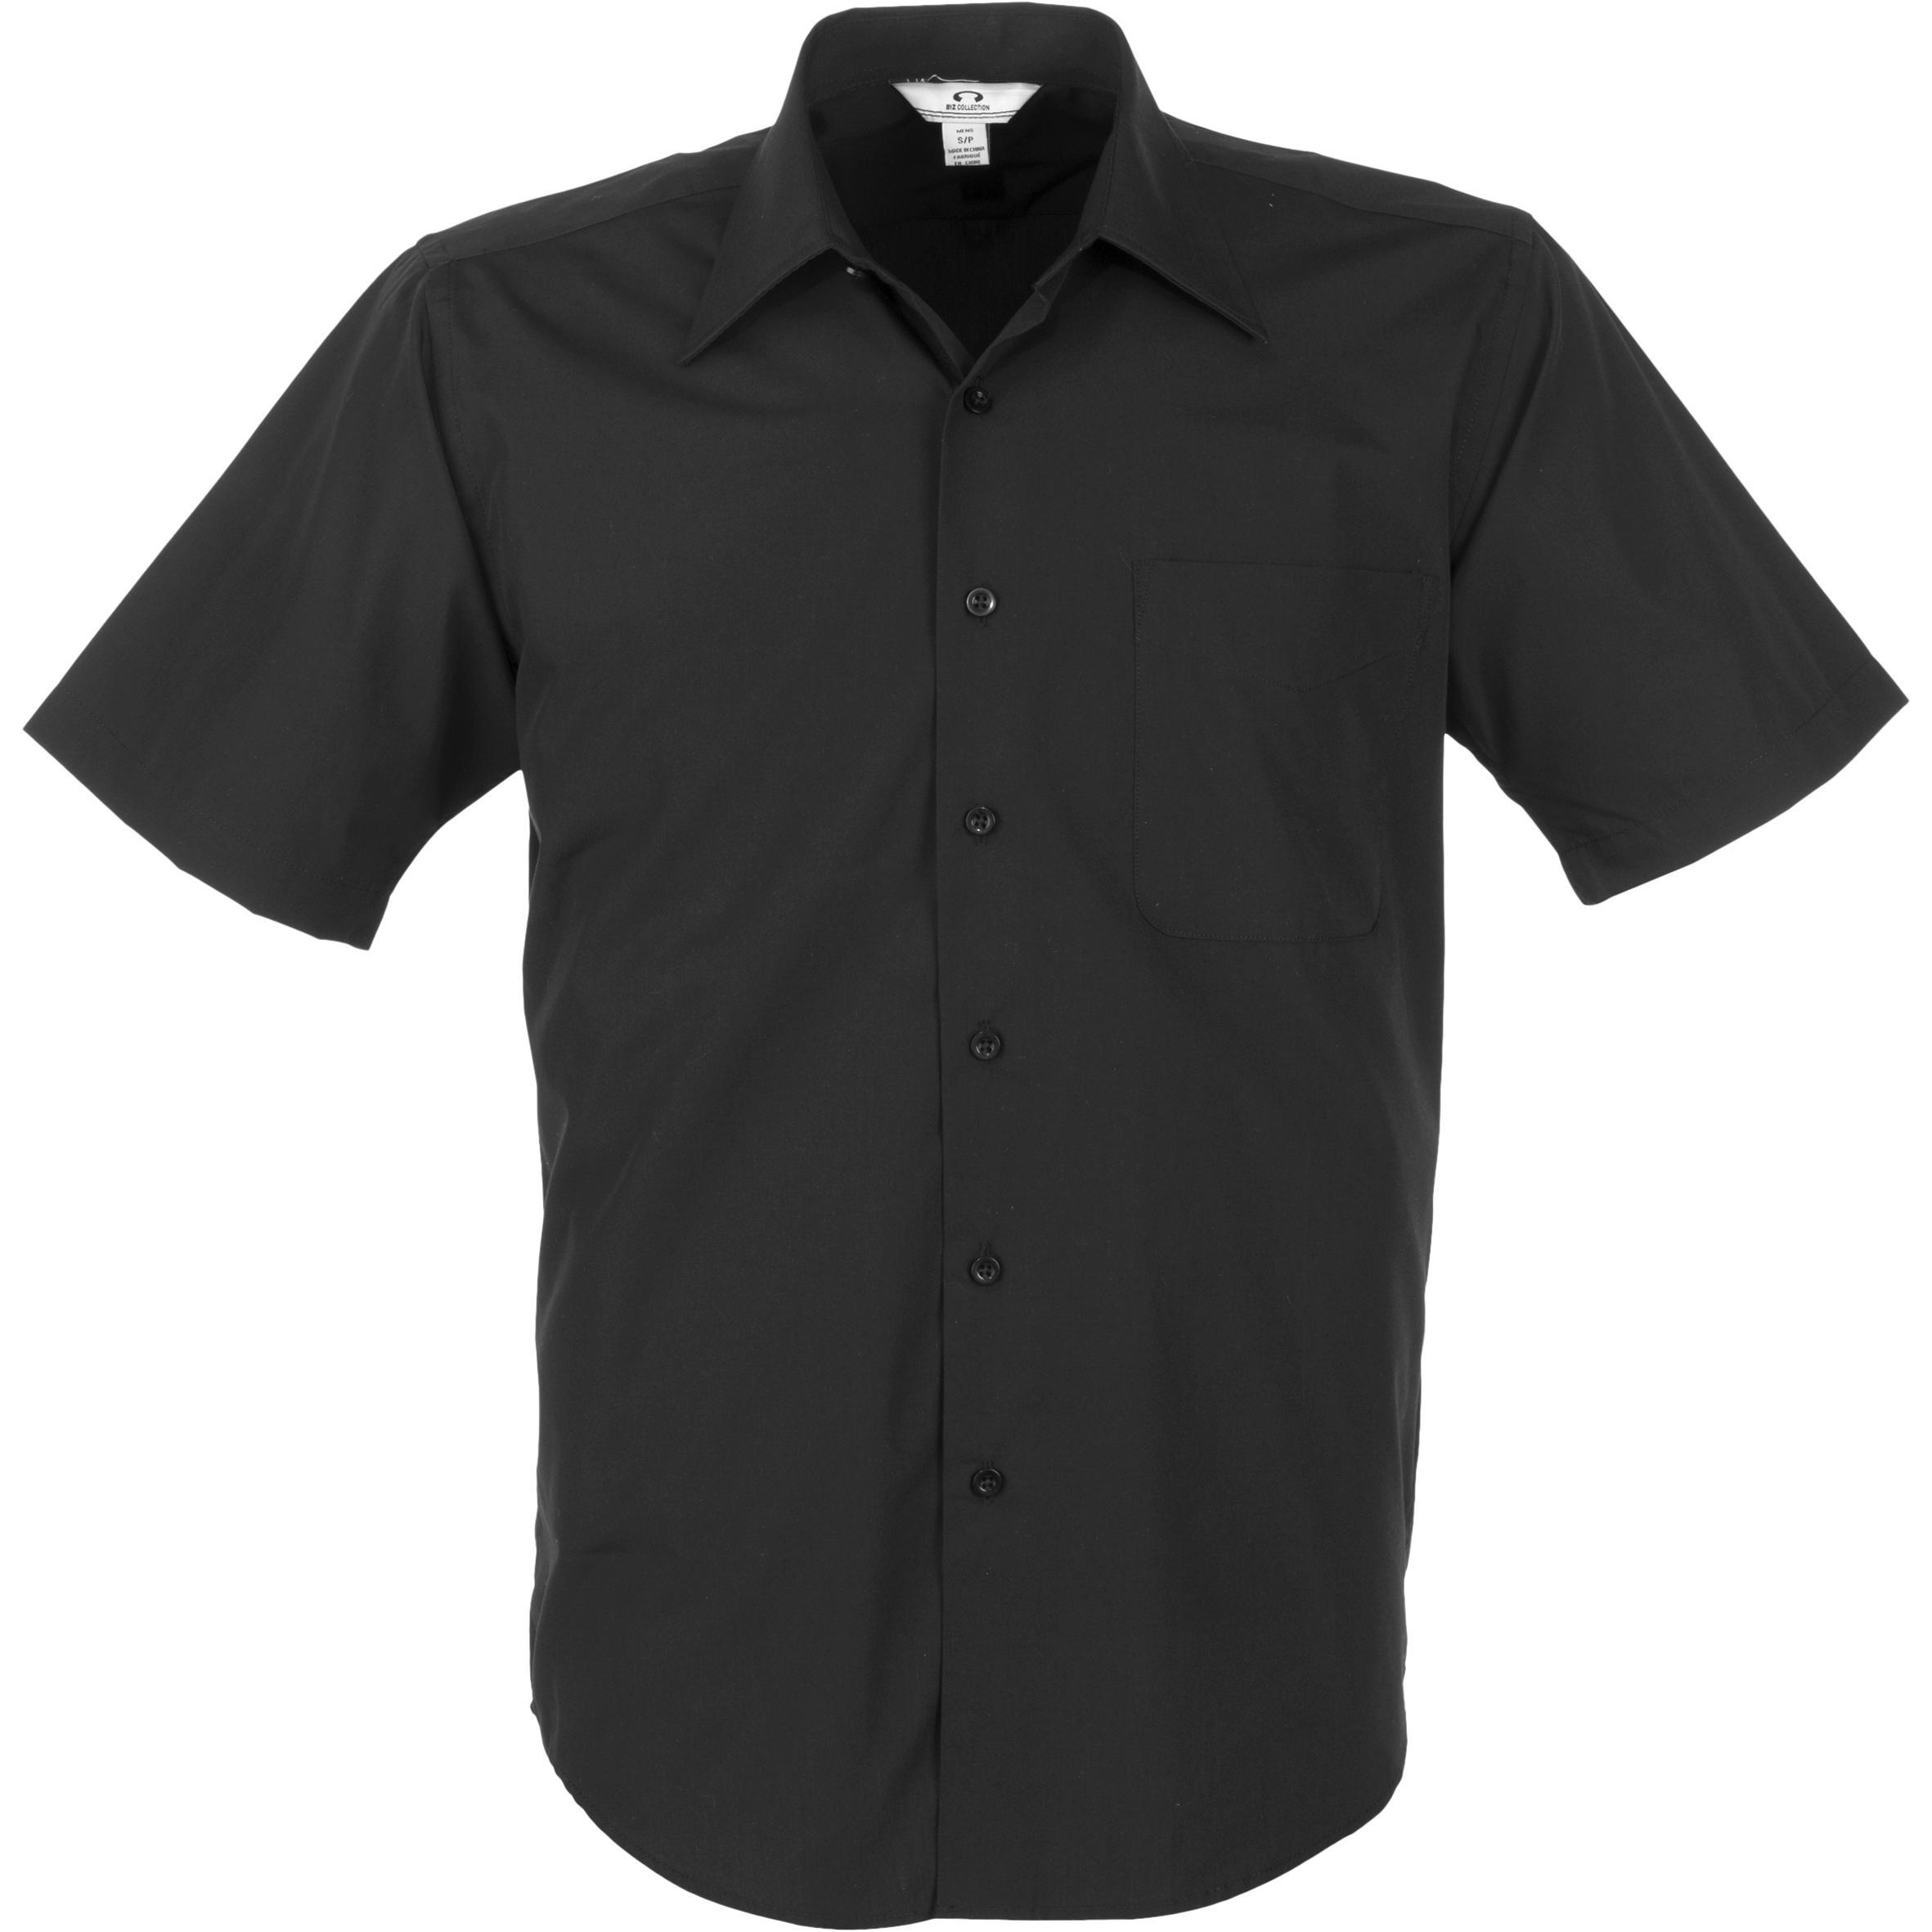 Mens Short Sleeve Metro Shirt - Black Only